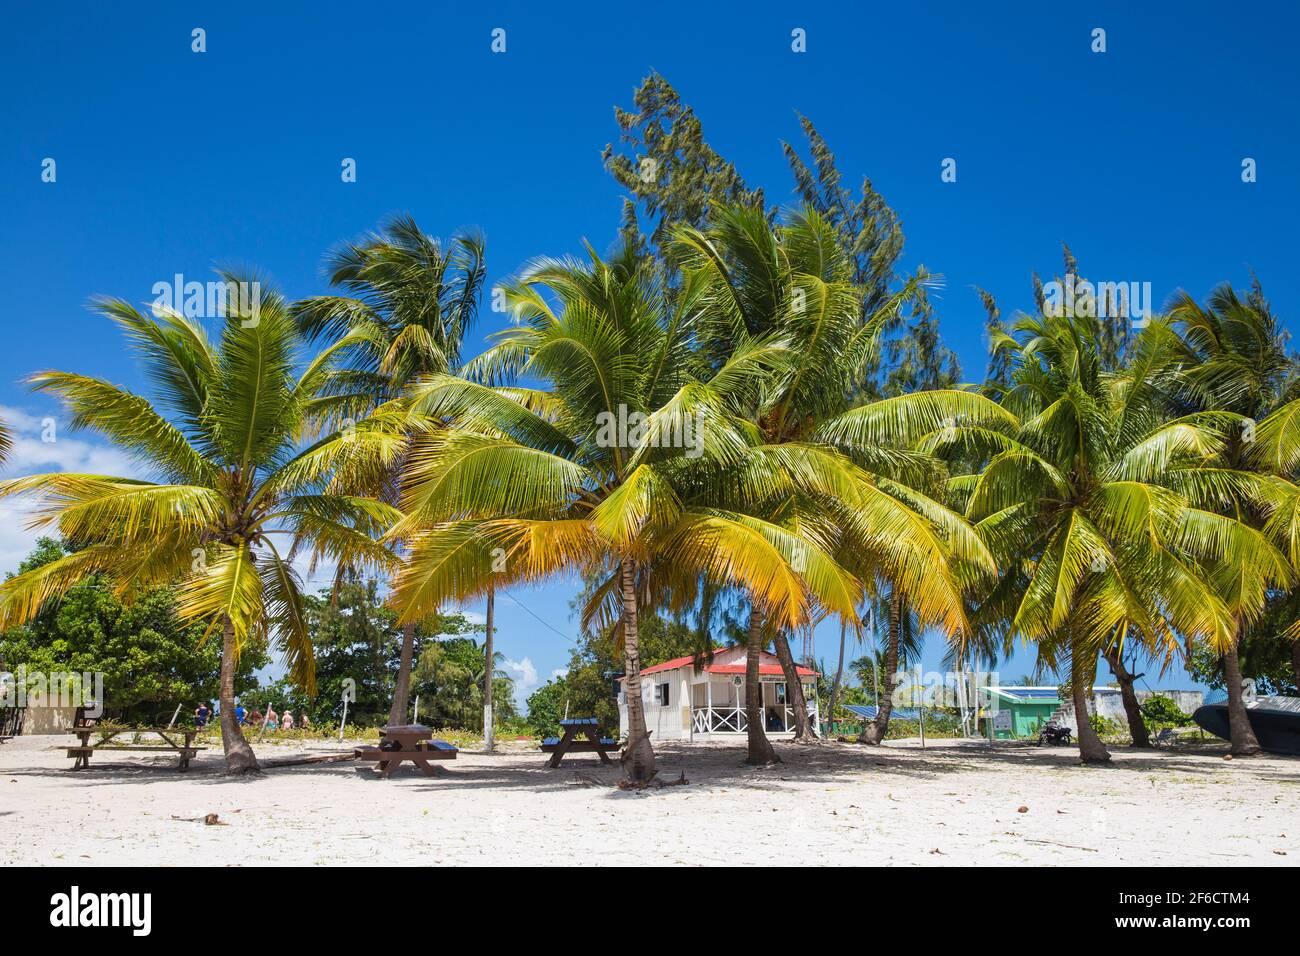 Dominican Republic, Punta Cana, Parque Nacional del Este, Saona Island, Beach at Mano Juan fishing village Stock Photo